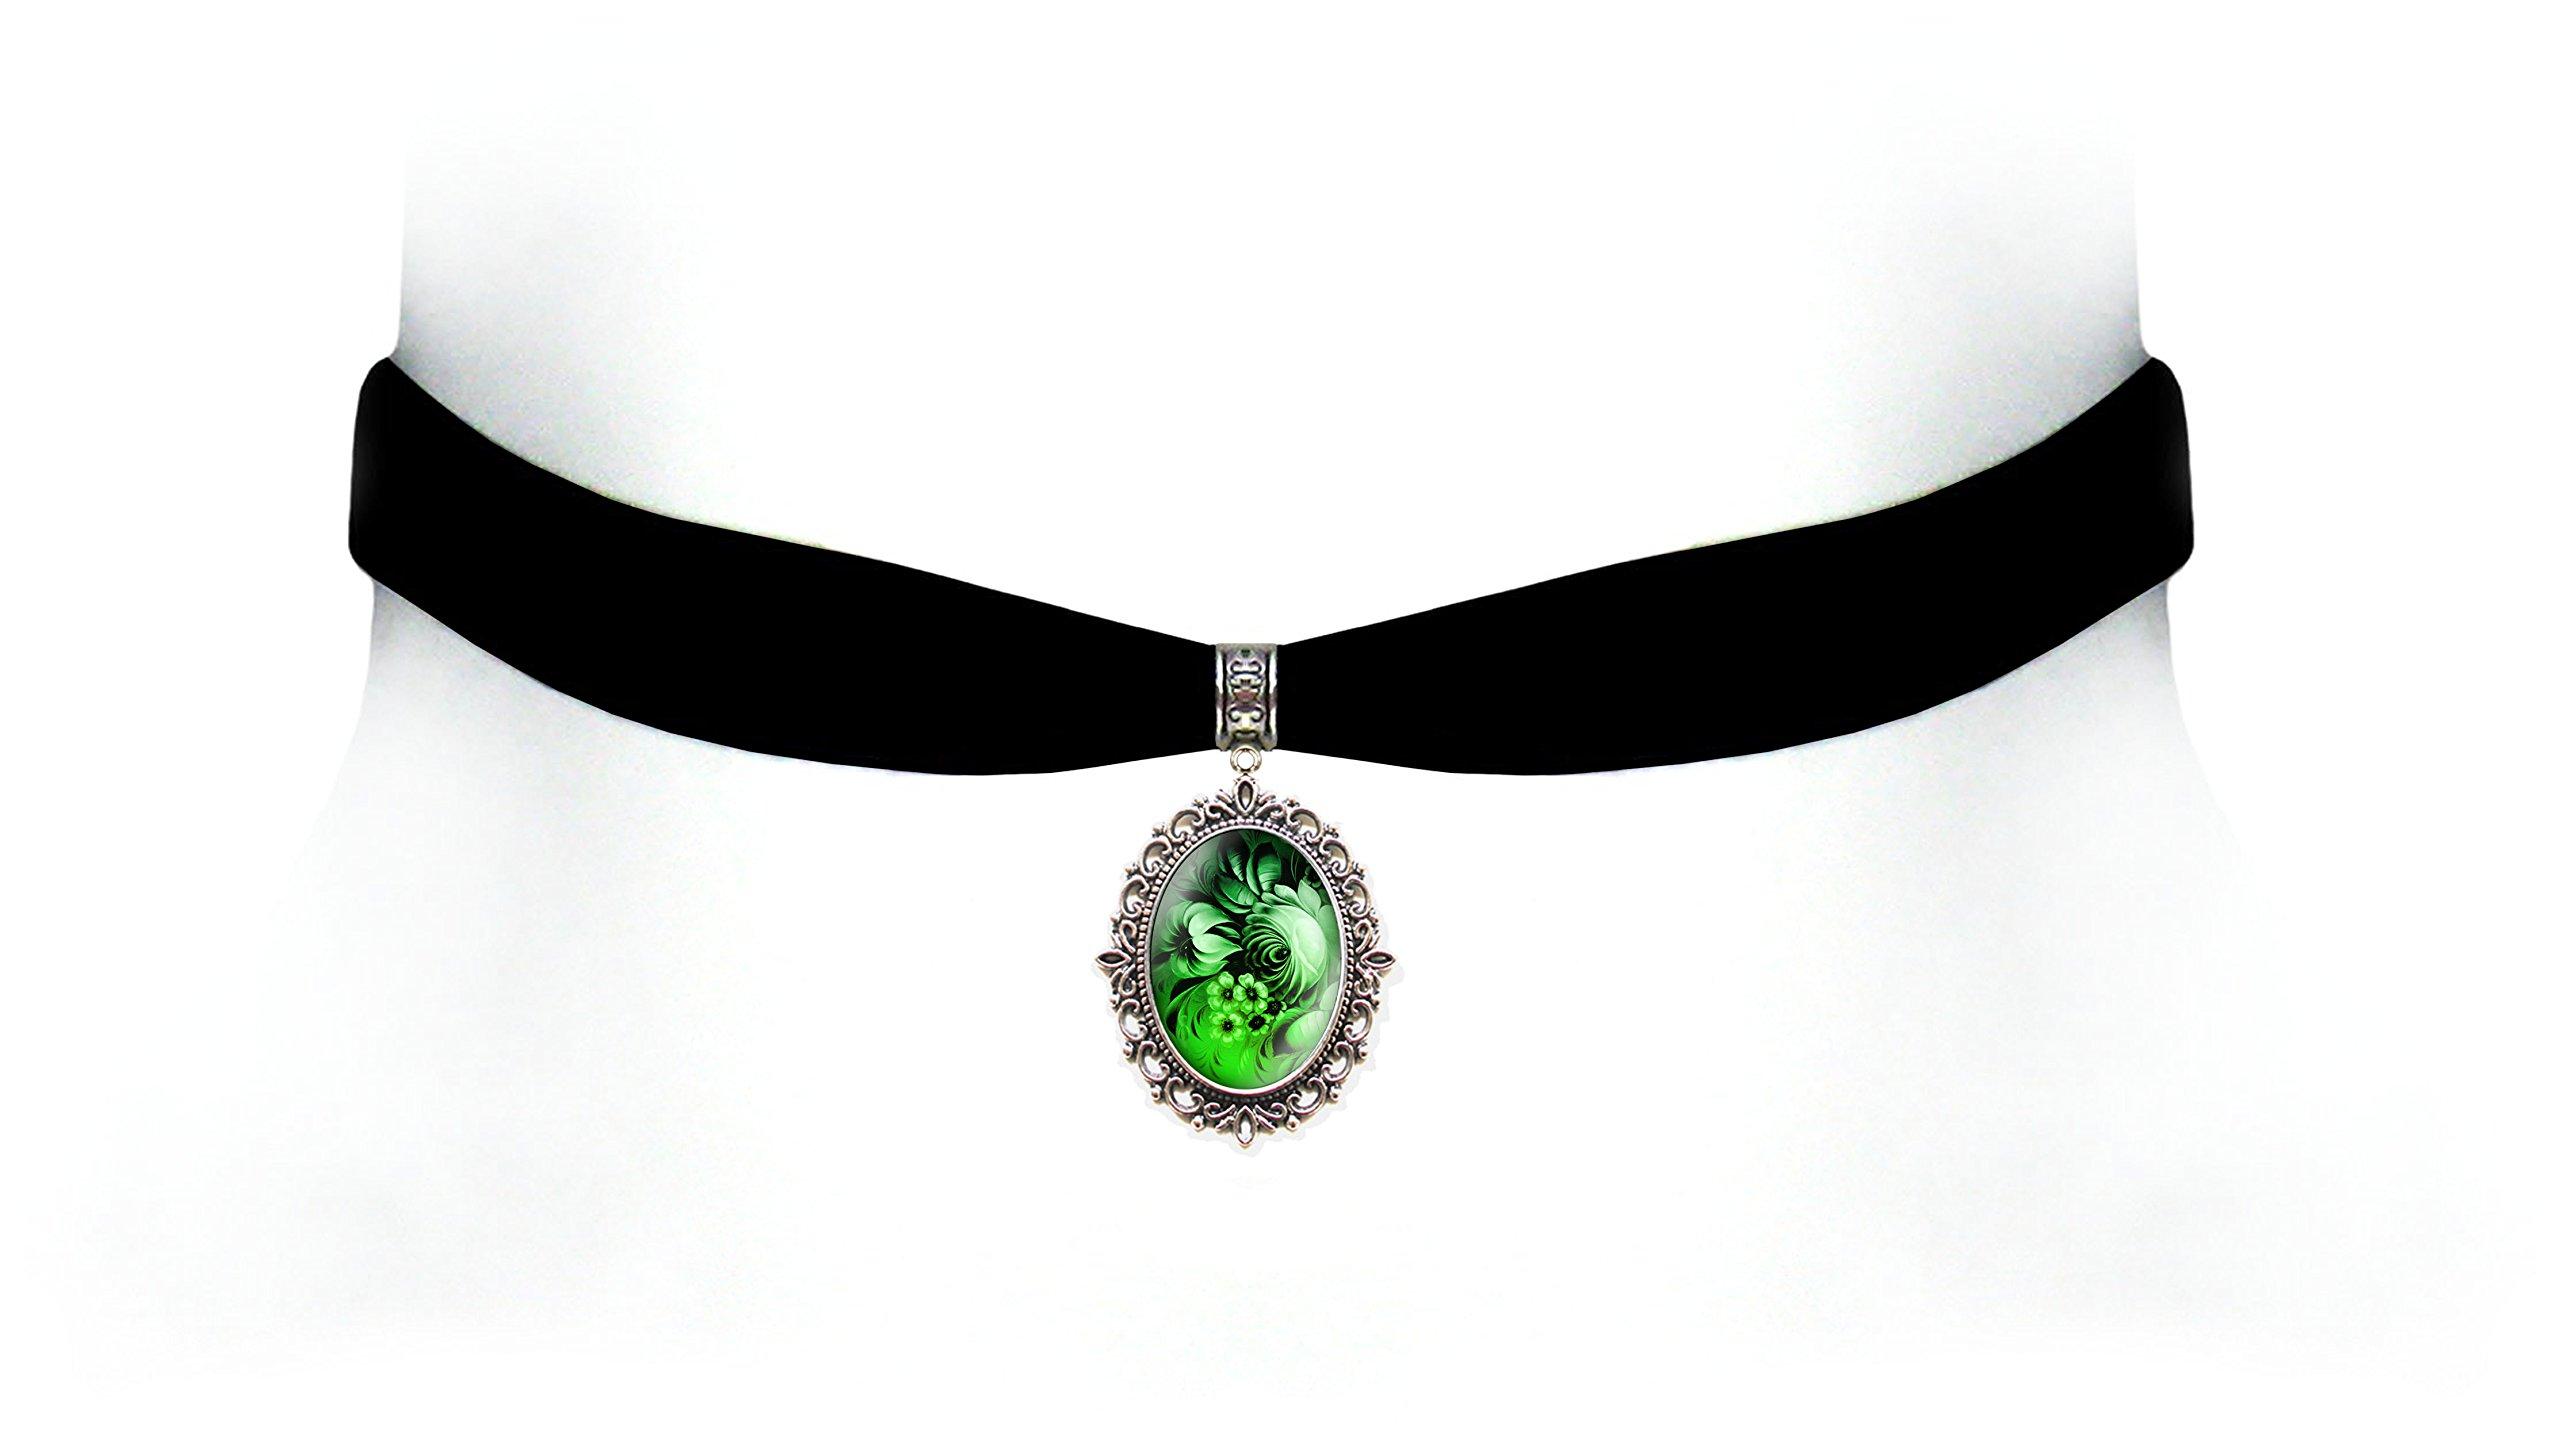 Victorian Vault Black Velvet Flower Choker Steampunk Gothic Pendant Necklace (Green)